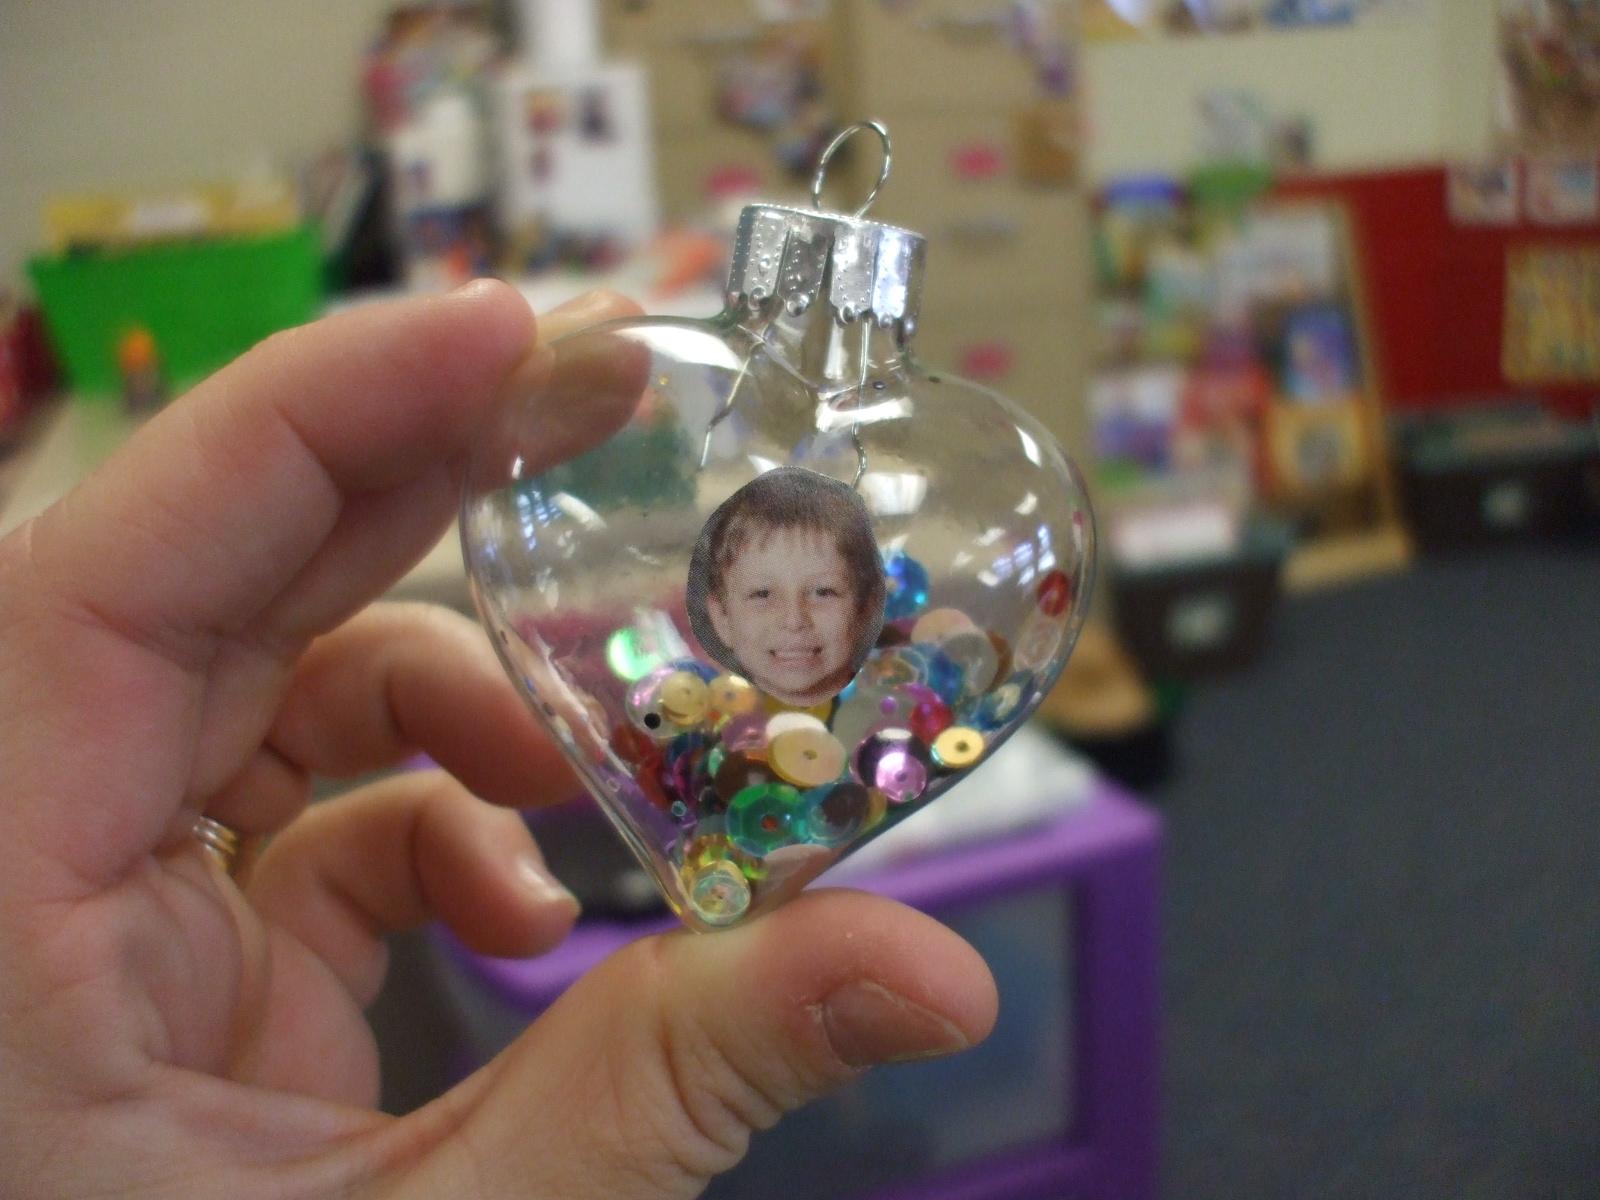 Christmas Gift Ideas For Kindergarten Parents : Mrs huff s kinder reindeer menorahs parent gifts